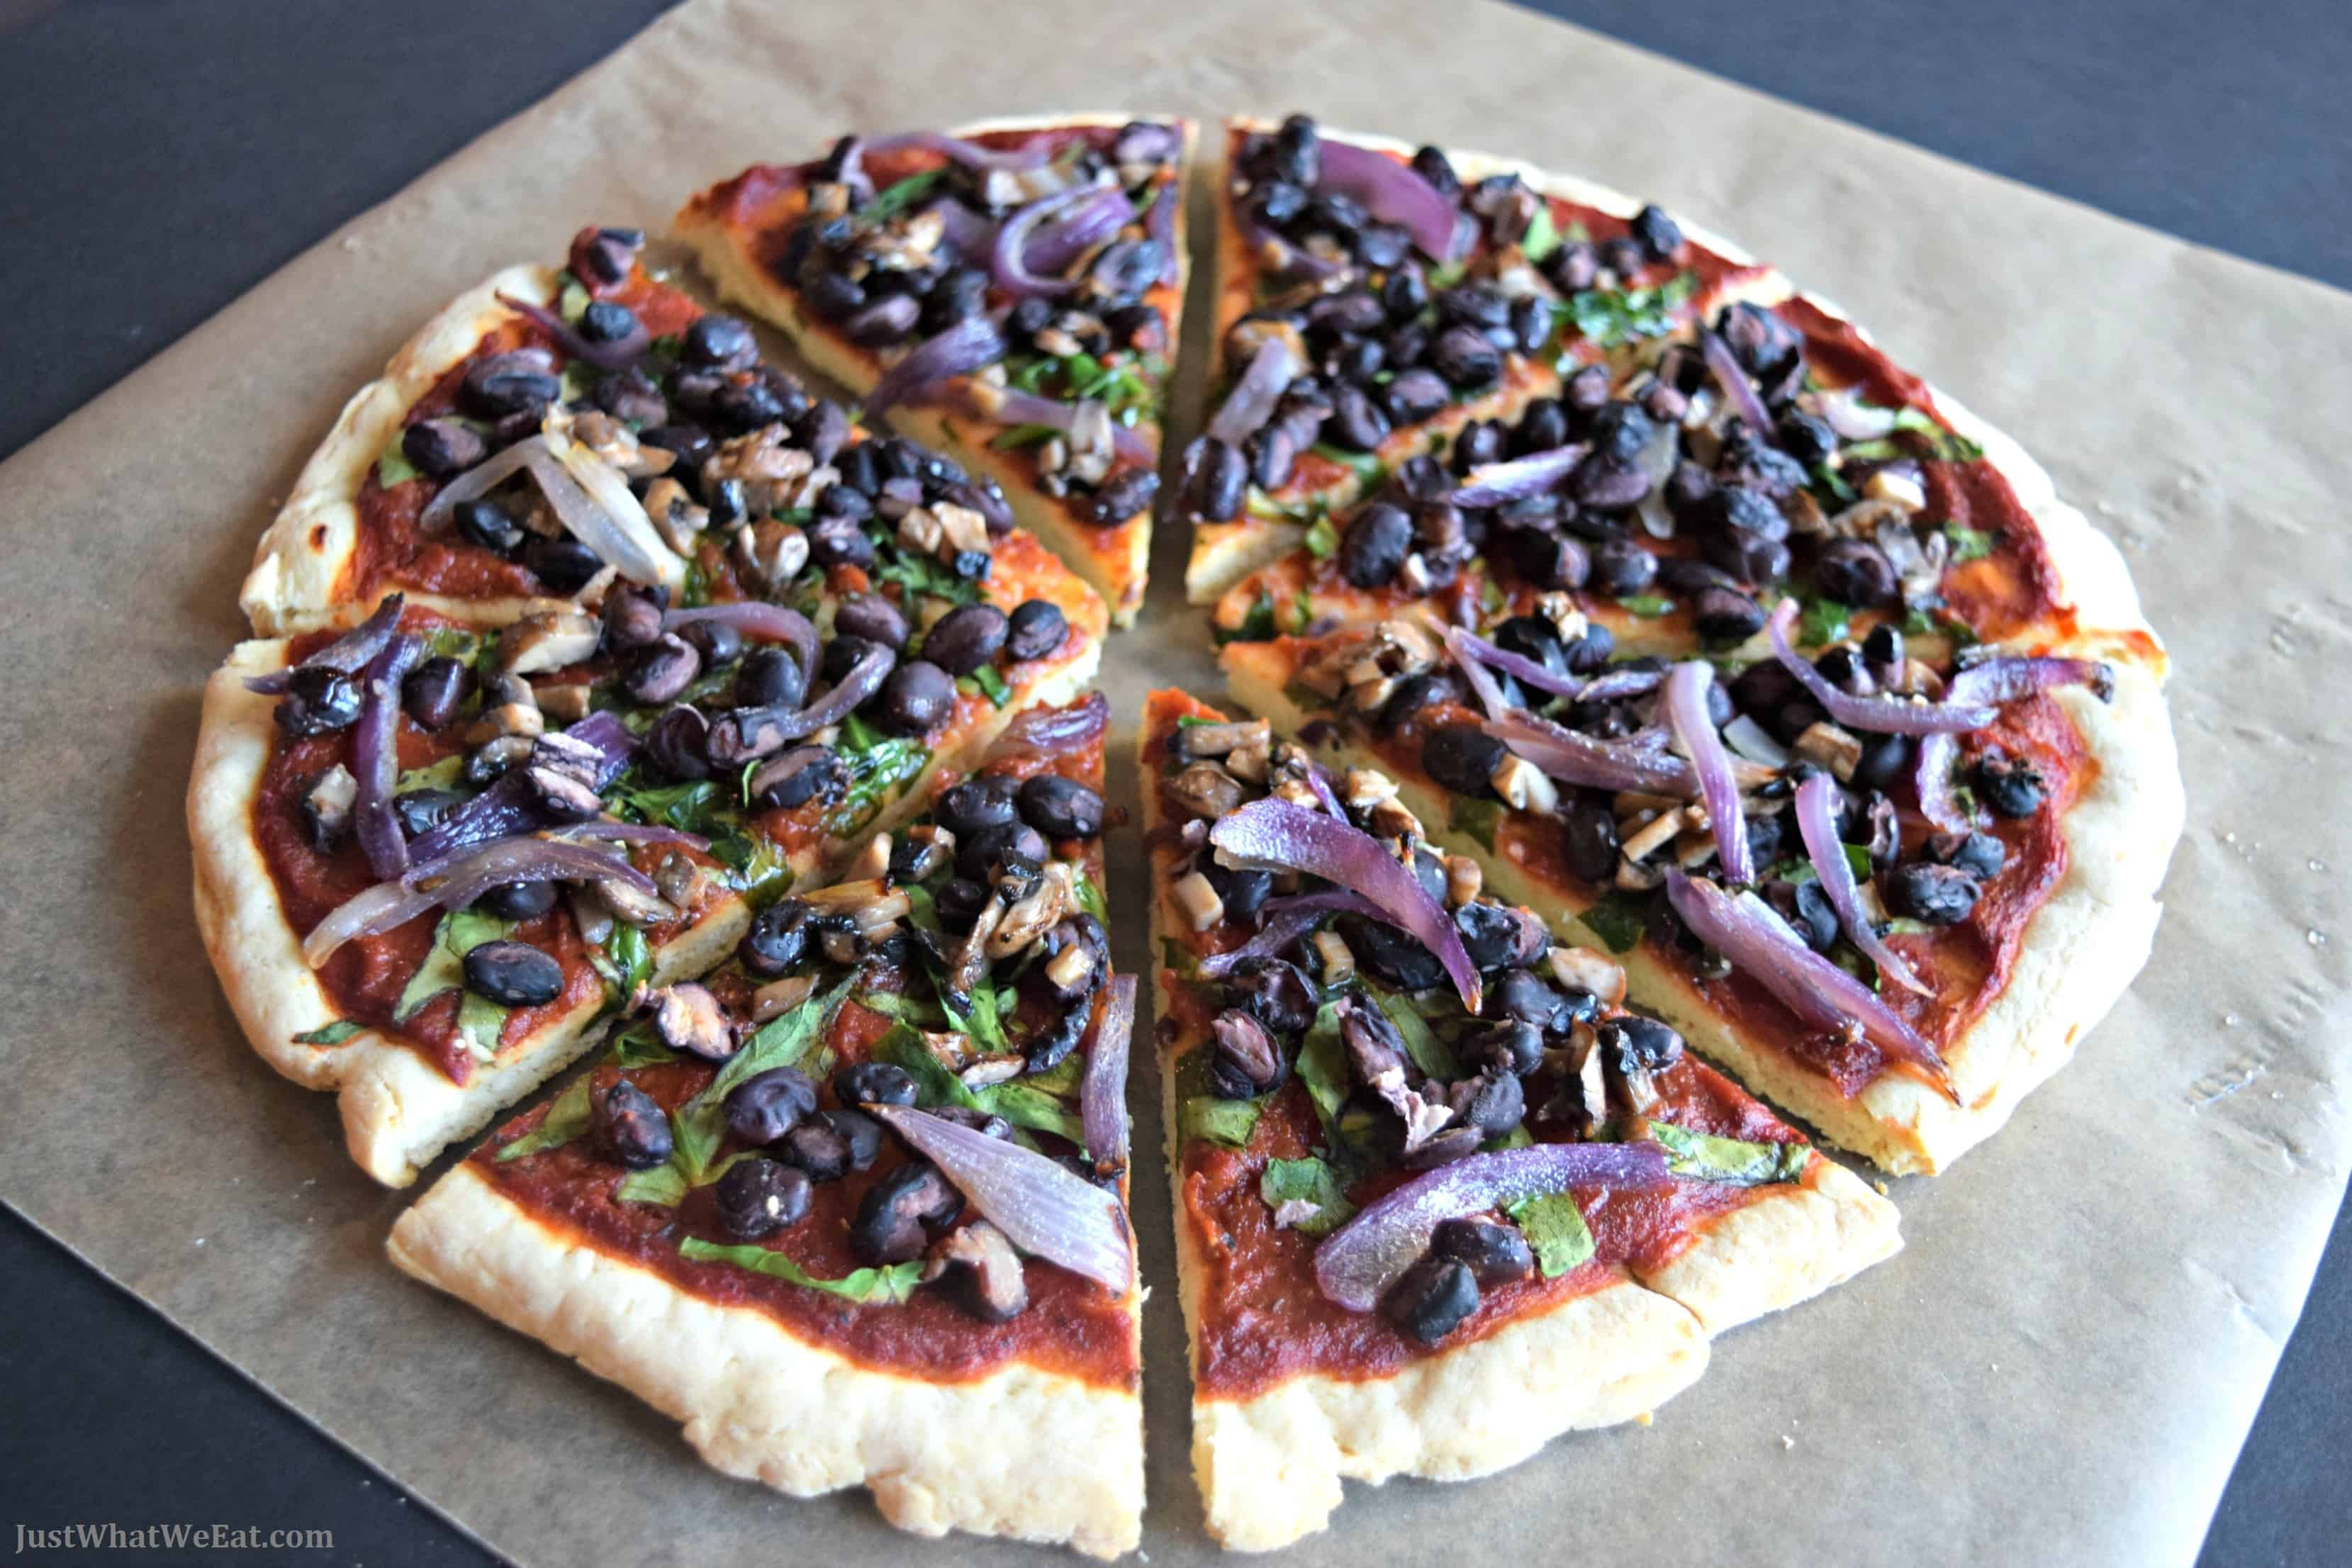 Pizza Crust - Gluten Free, Vegan, & Yeast Free